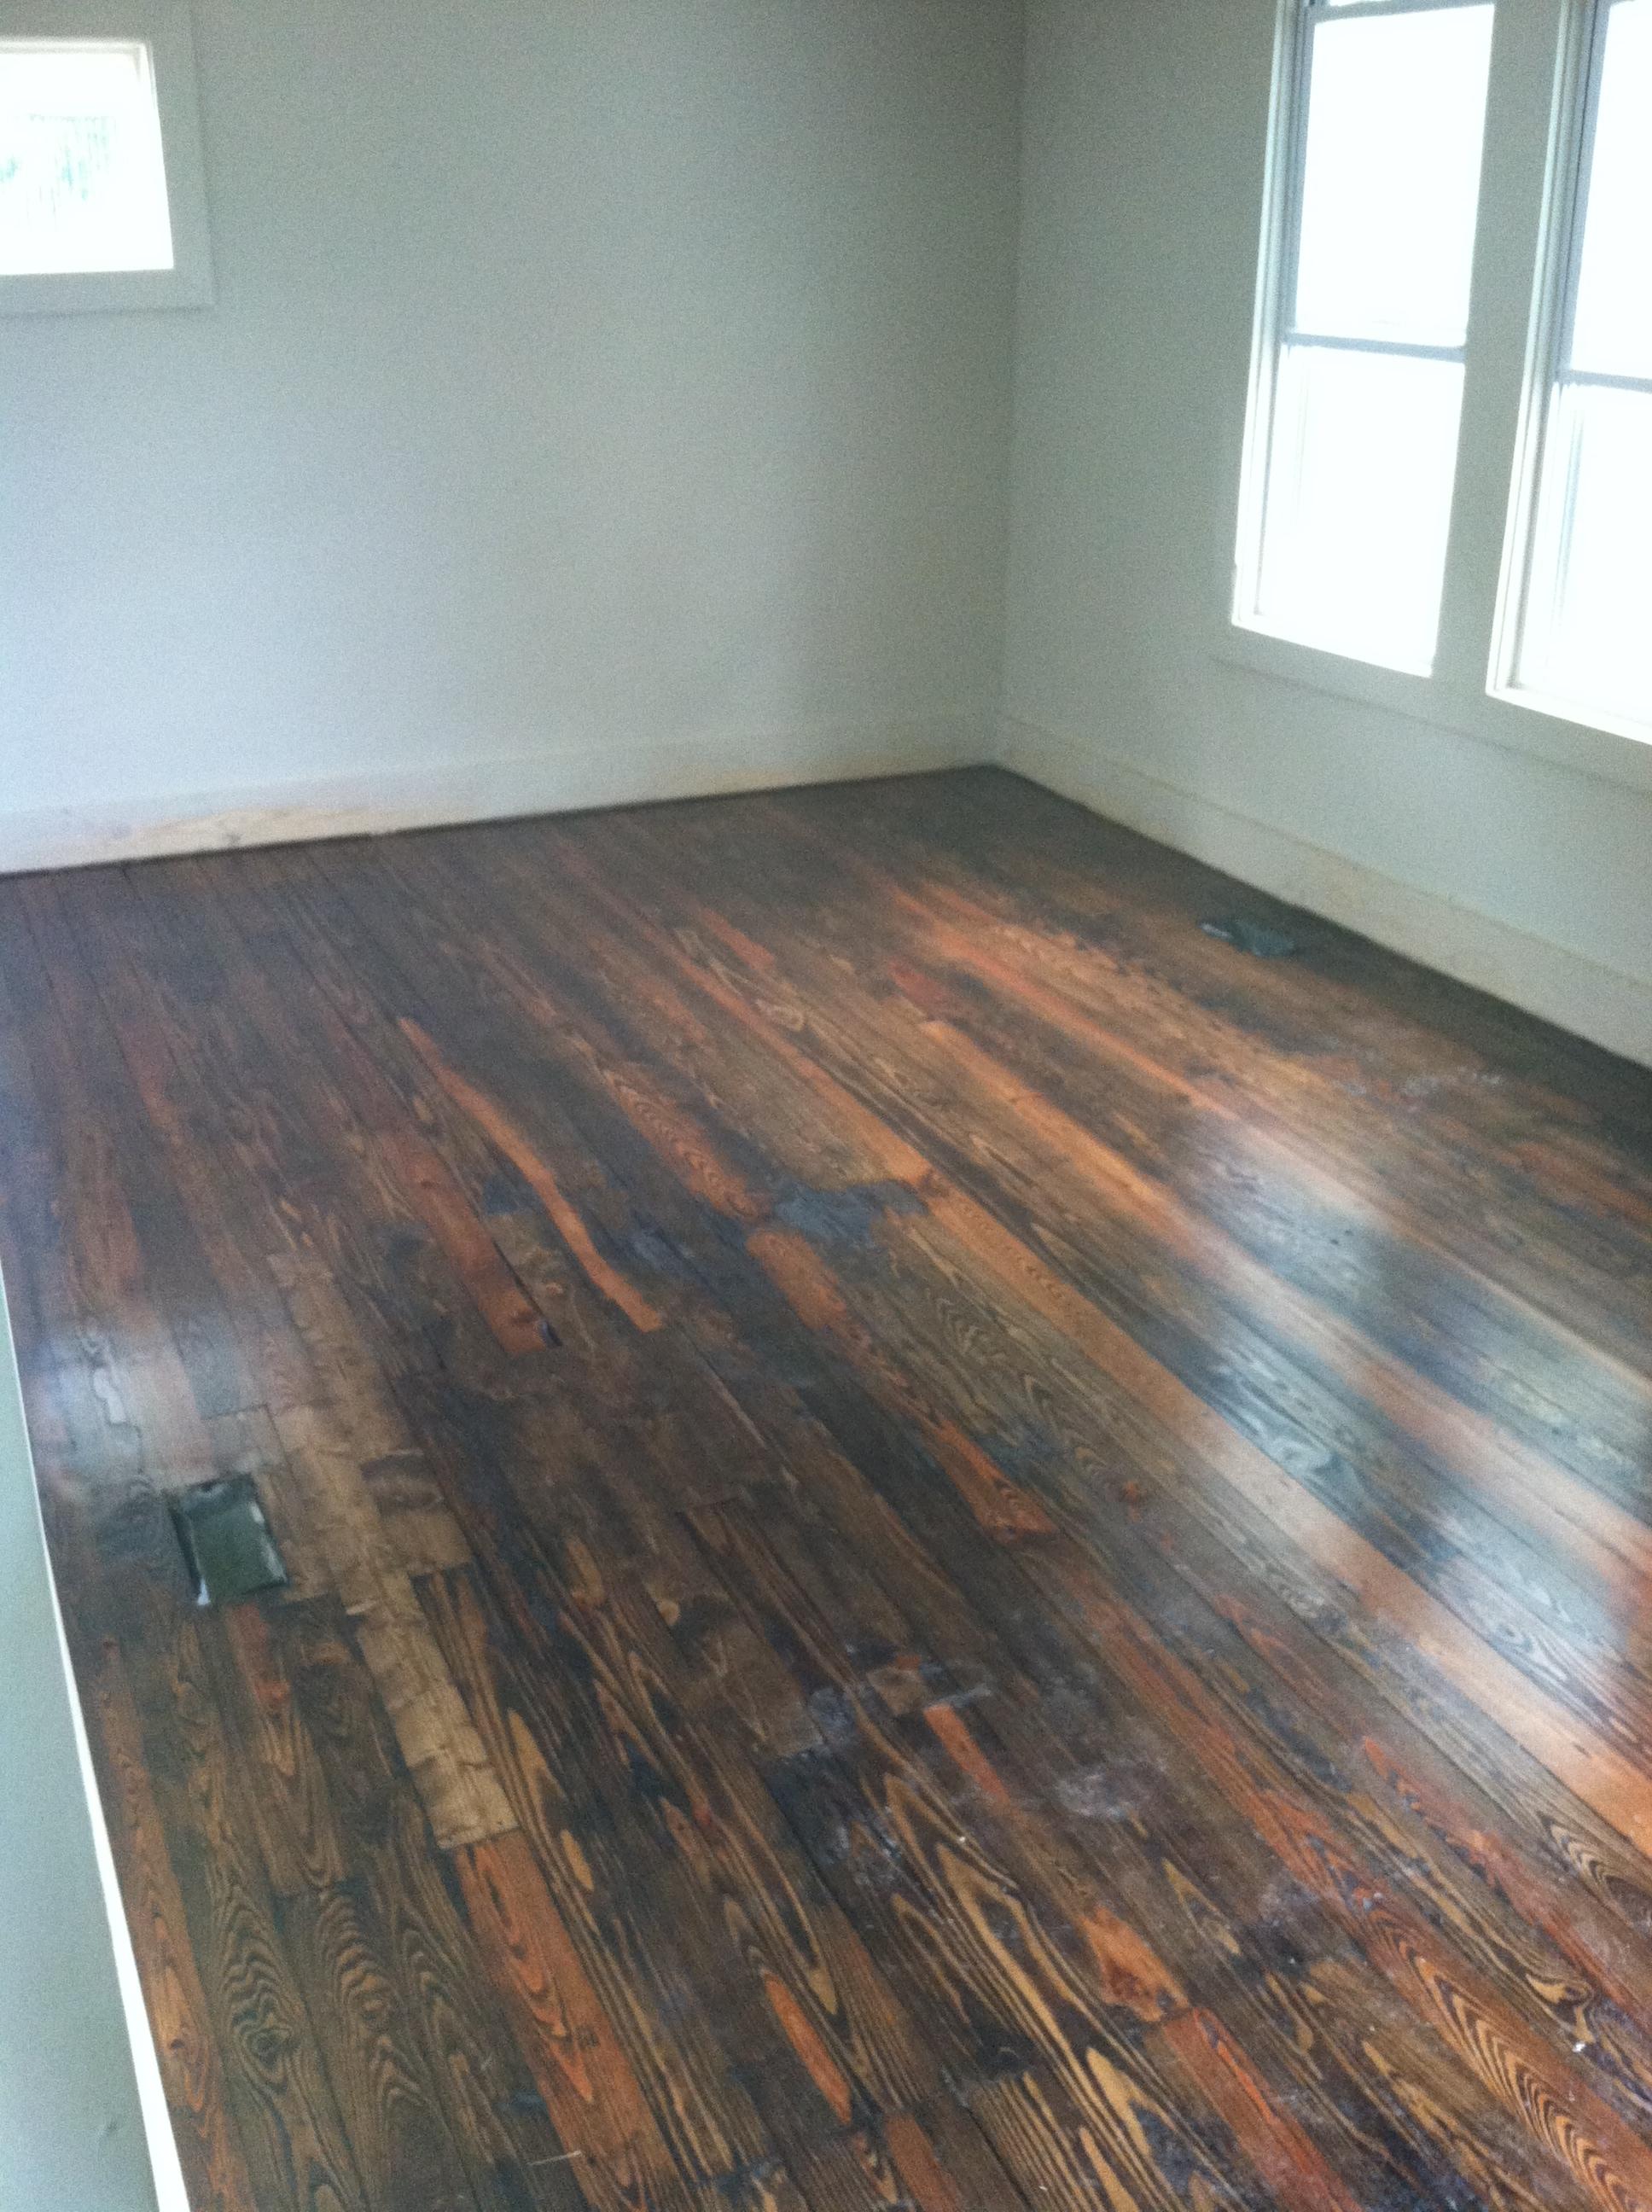 Sanding and Refinishing Old Pine Floors